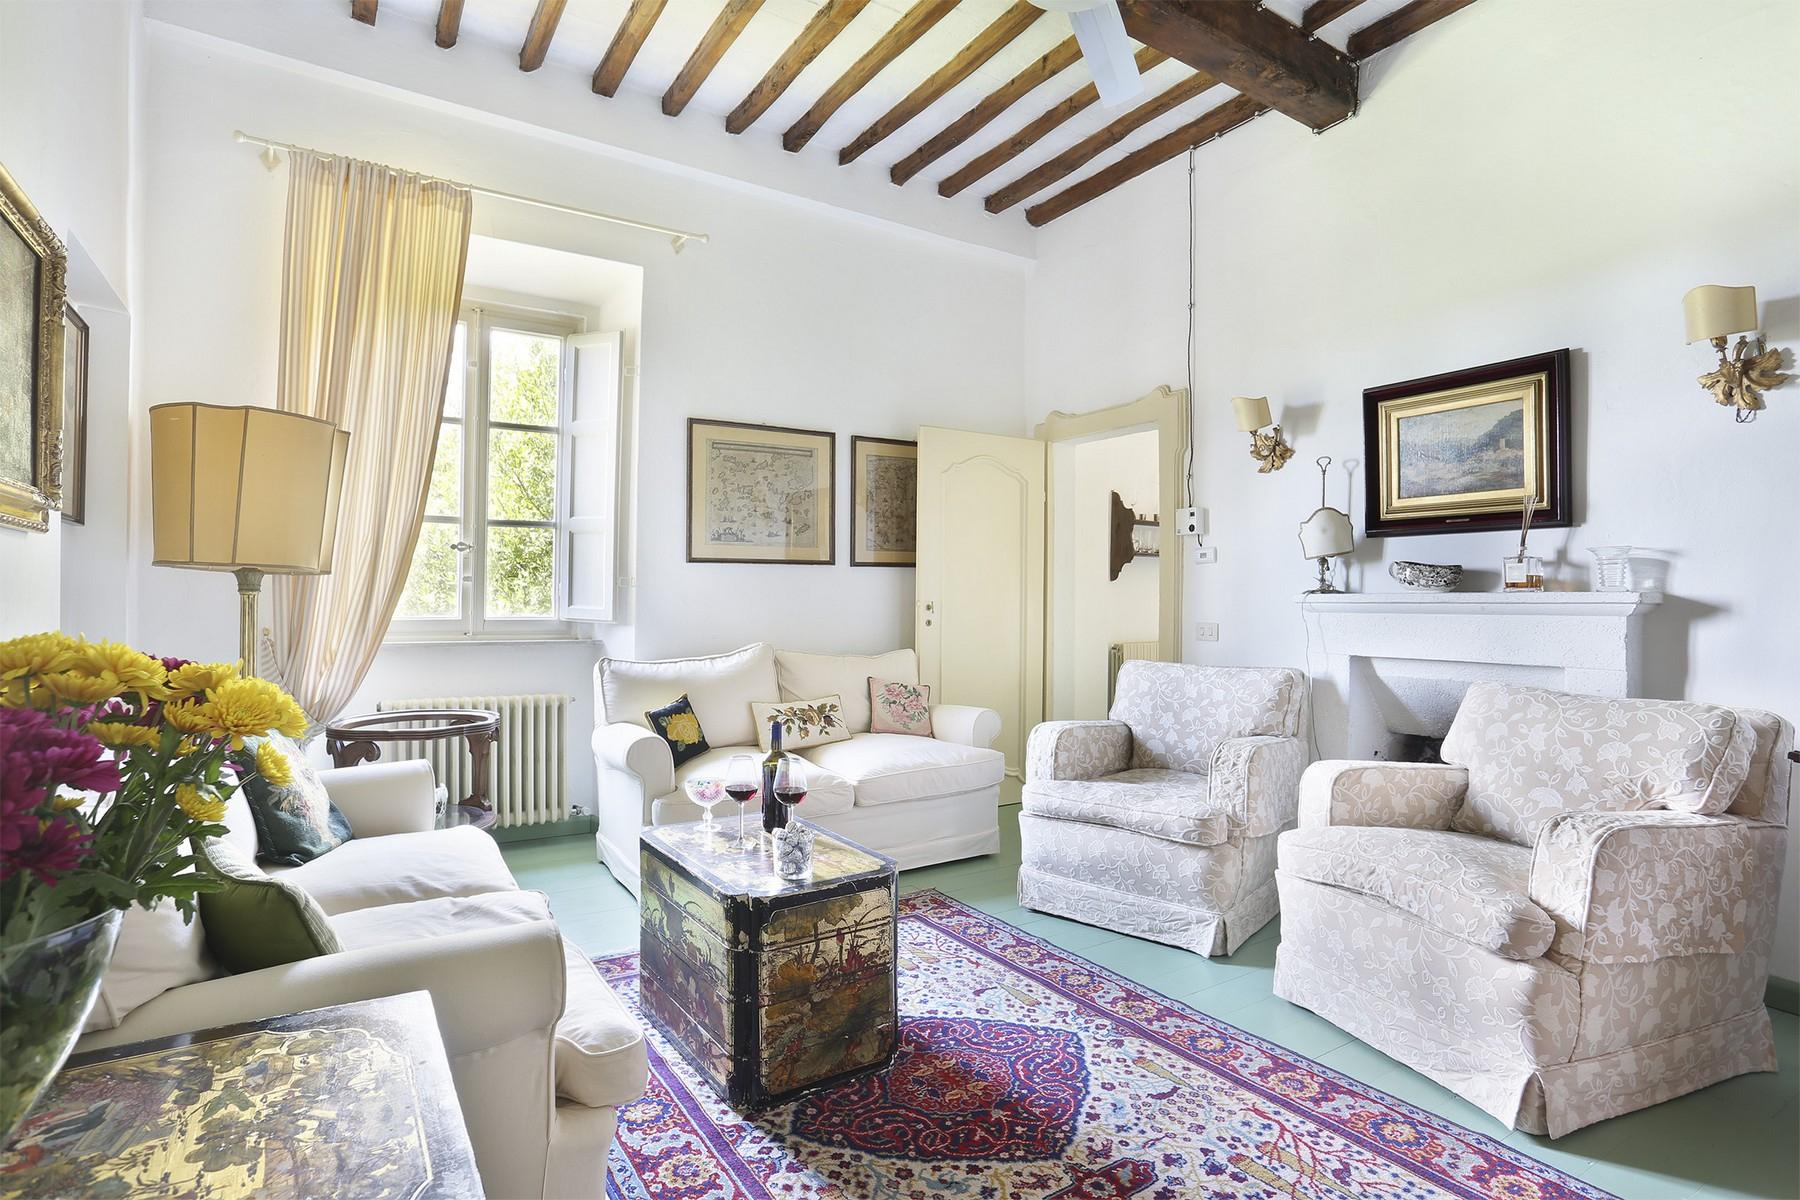 Villa in Vendita a Lucca: 5 locali, 735 mq - Foto 20